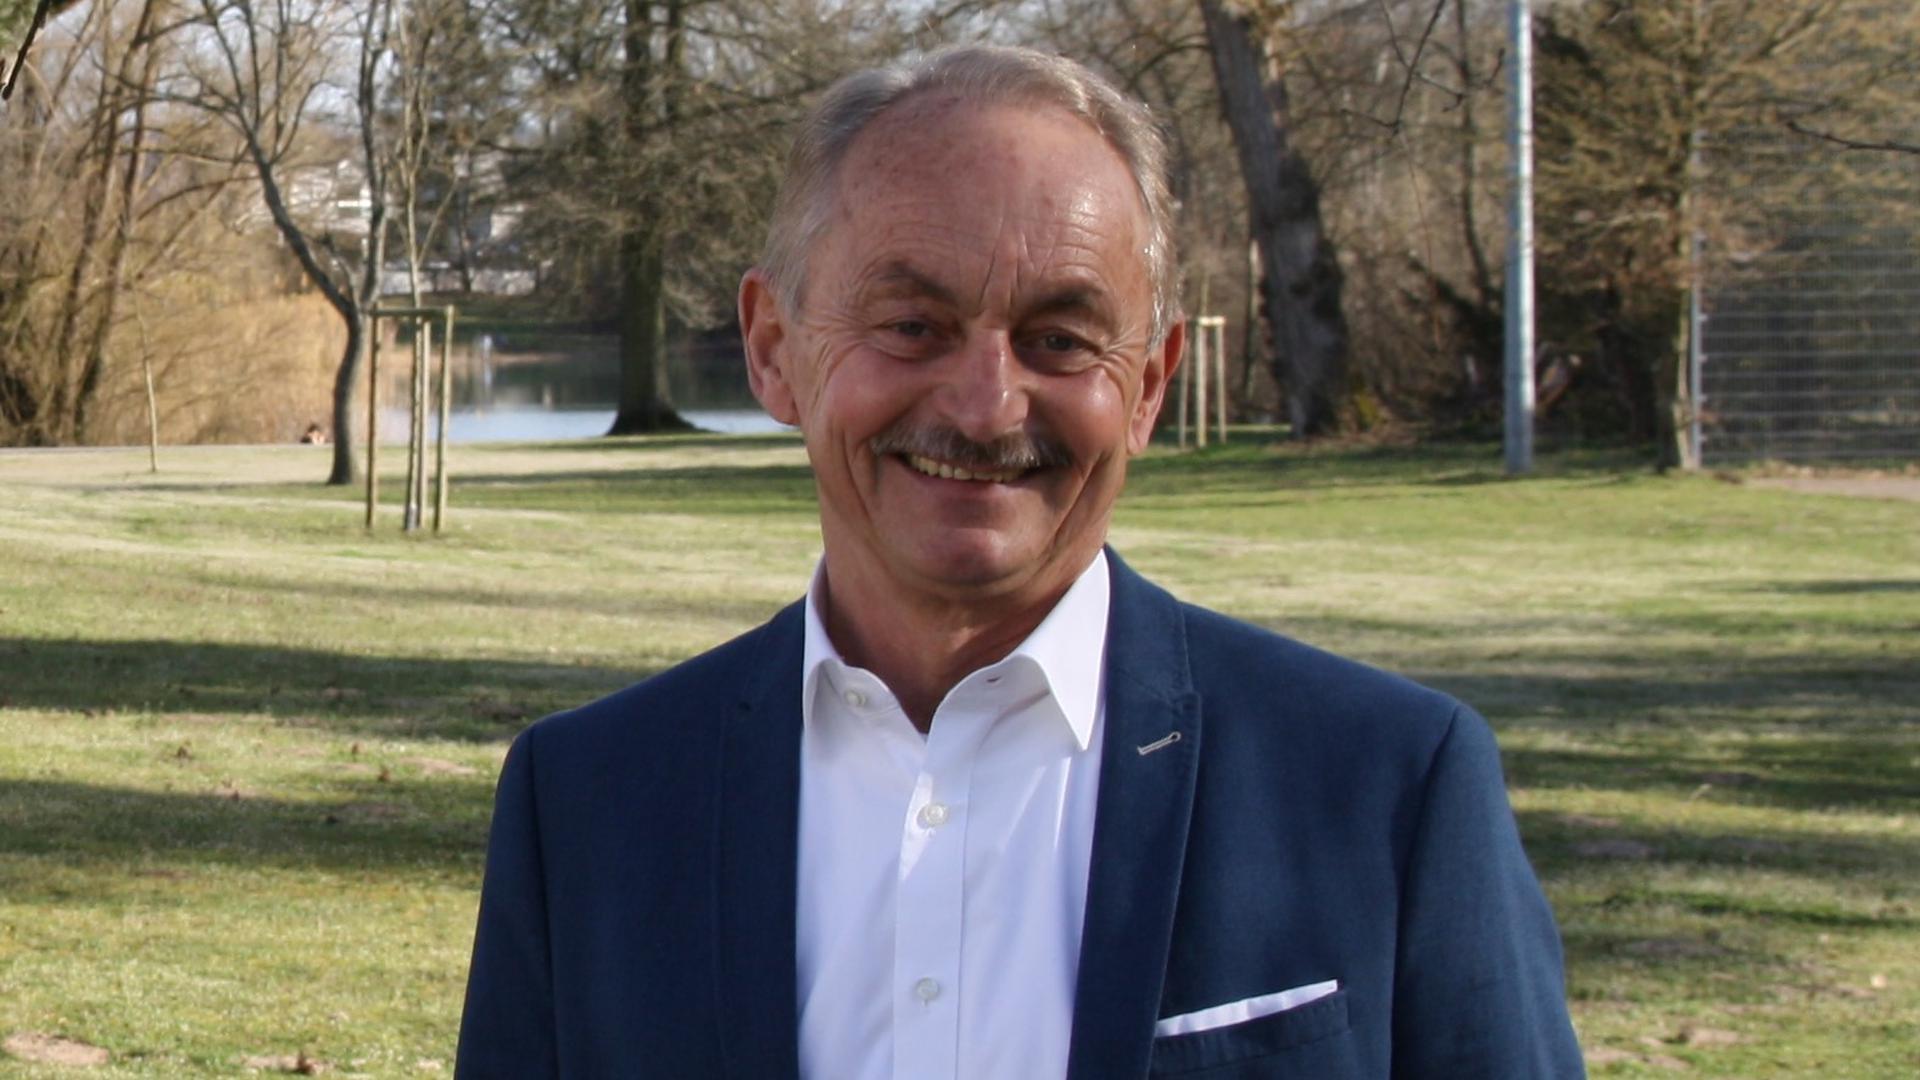 Emil Kniel